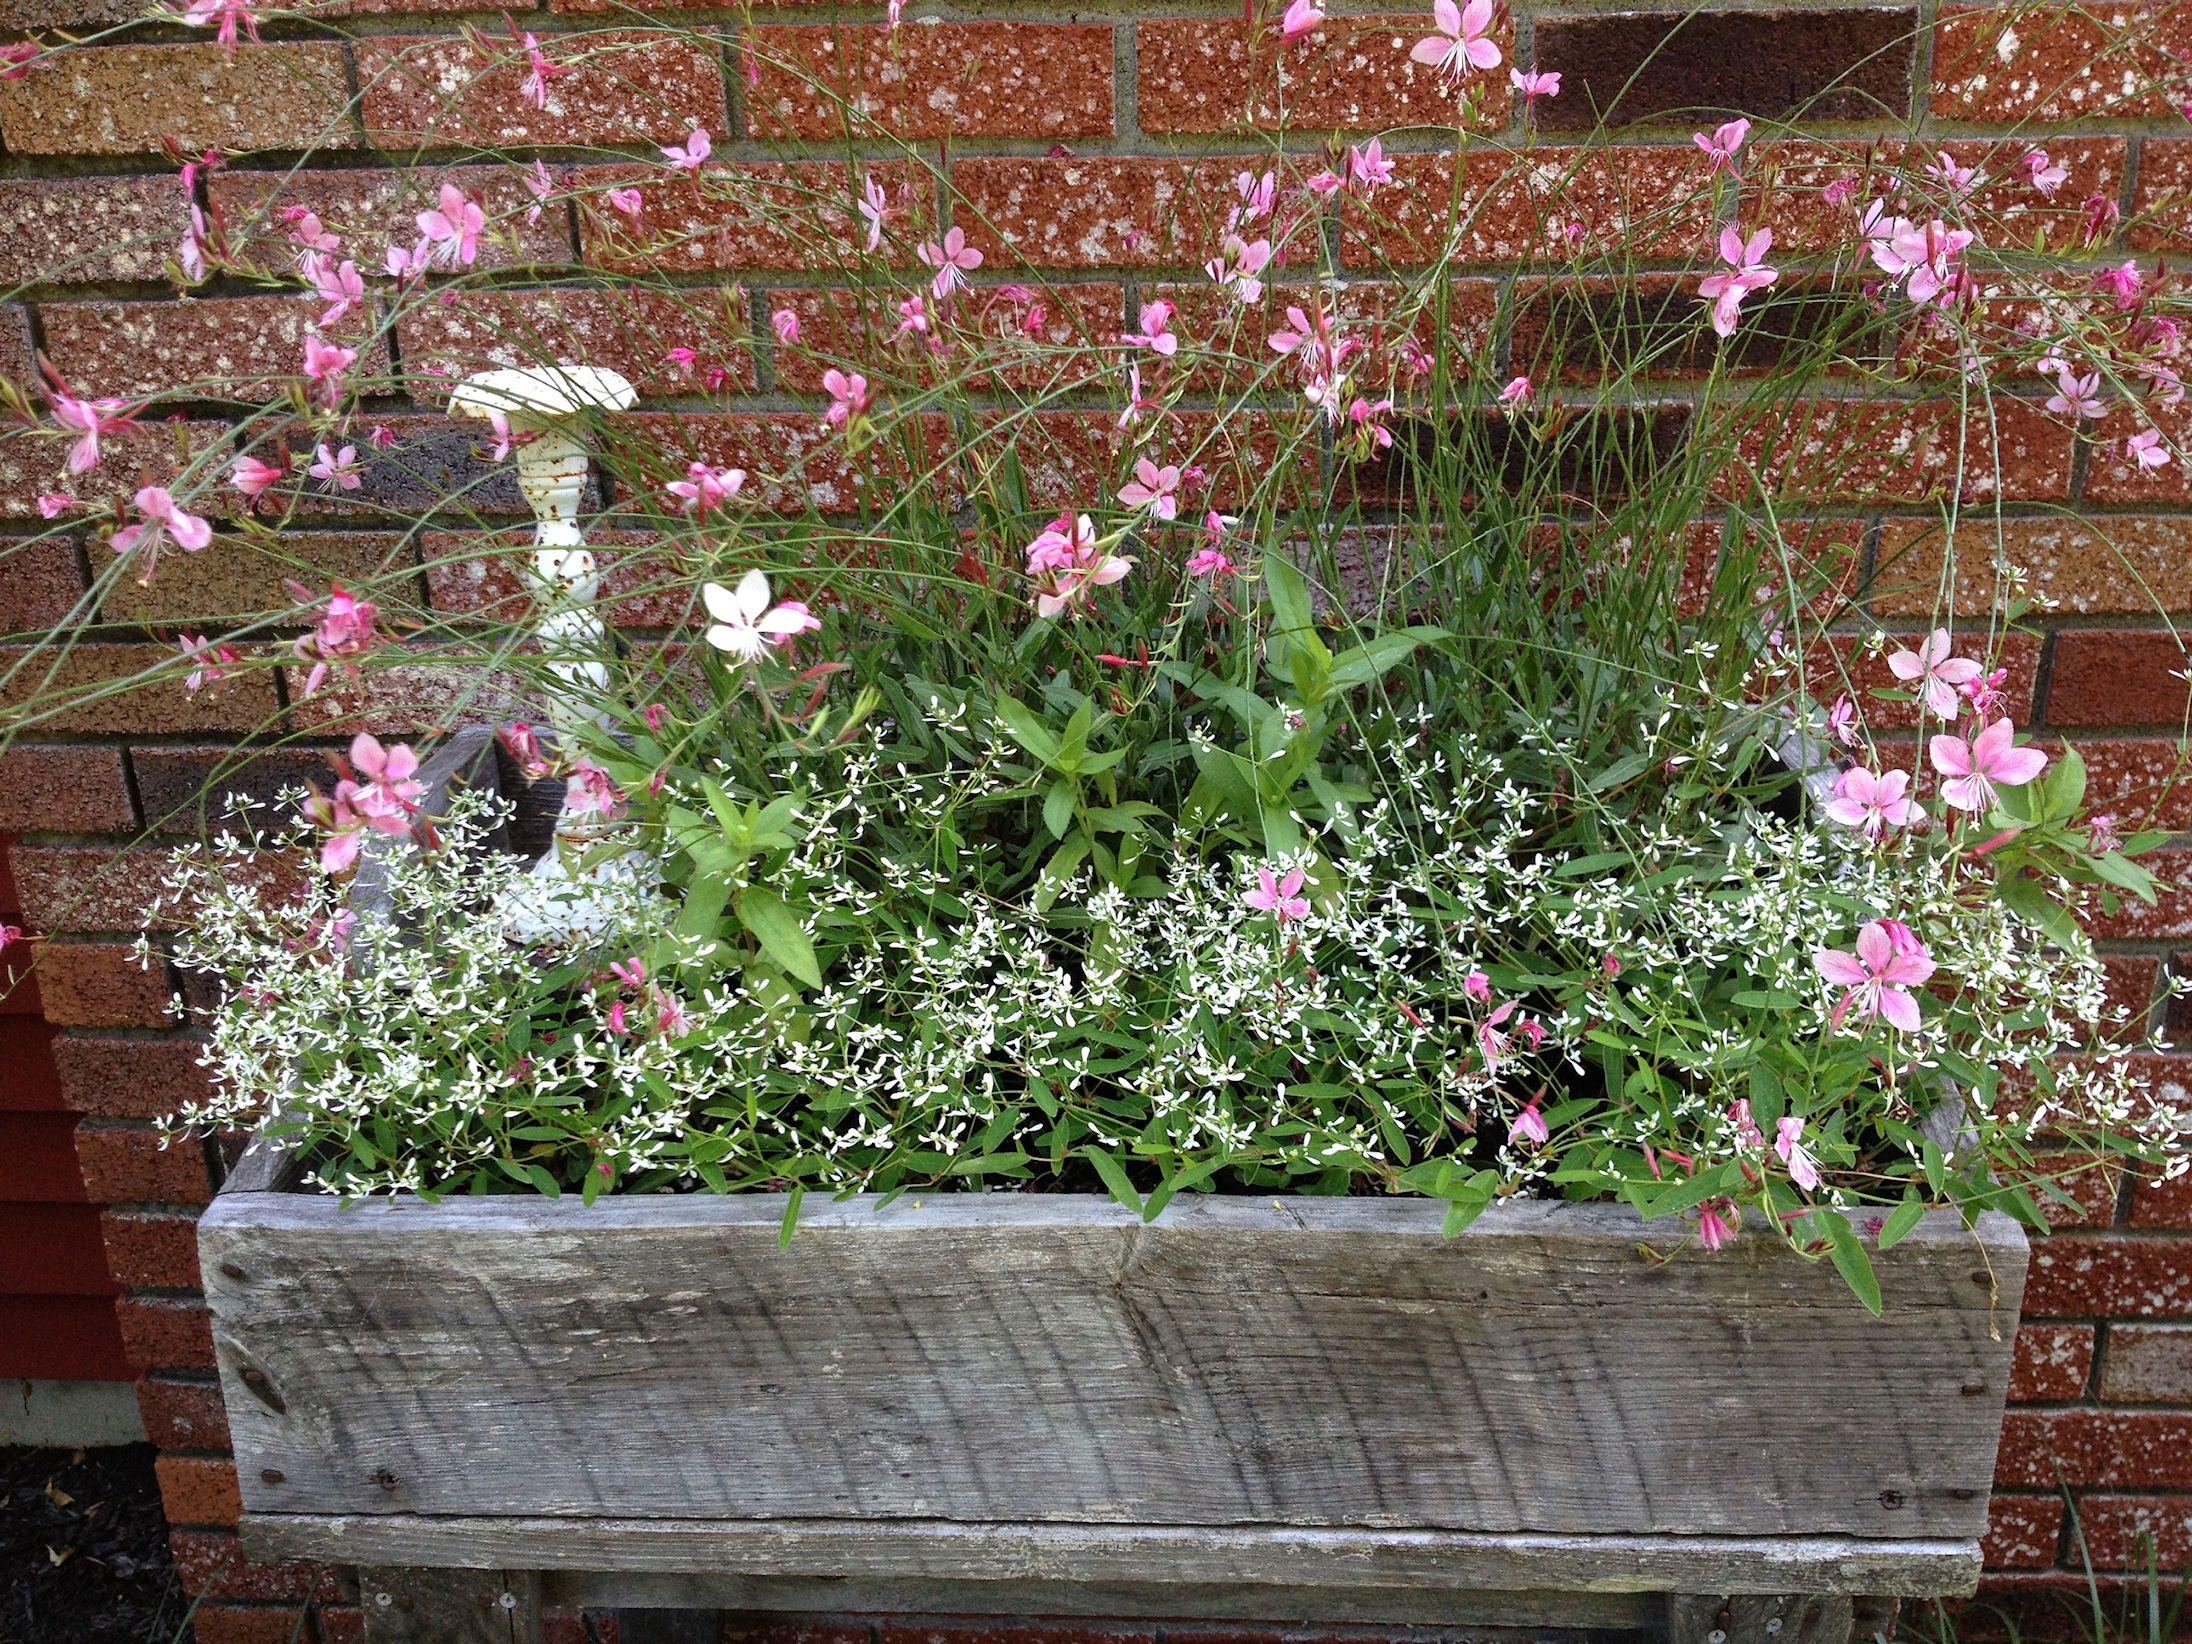 Home garden design flower  Pin by Wendy Rexus on Landscaping  Pinterest  Gardens